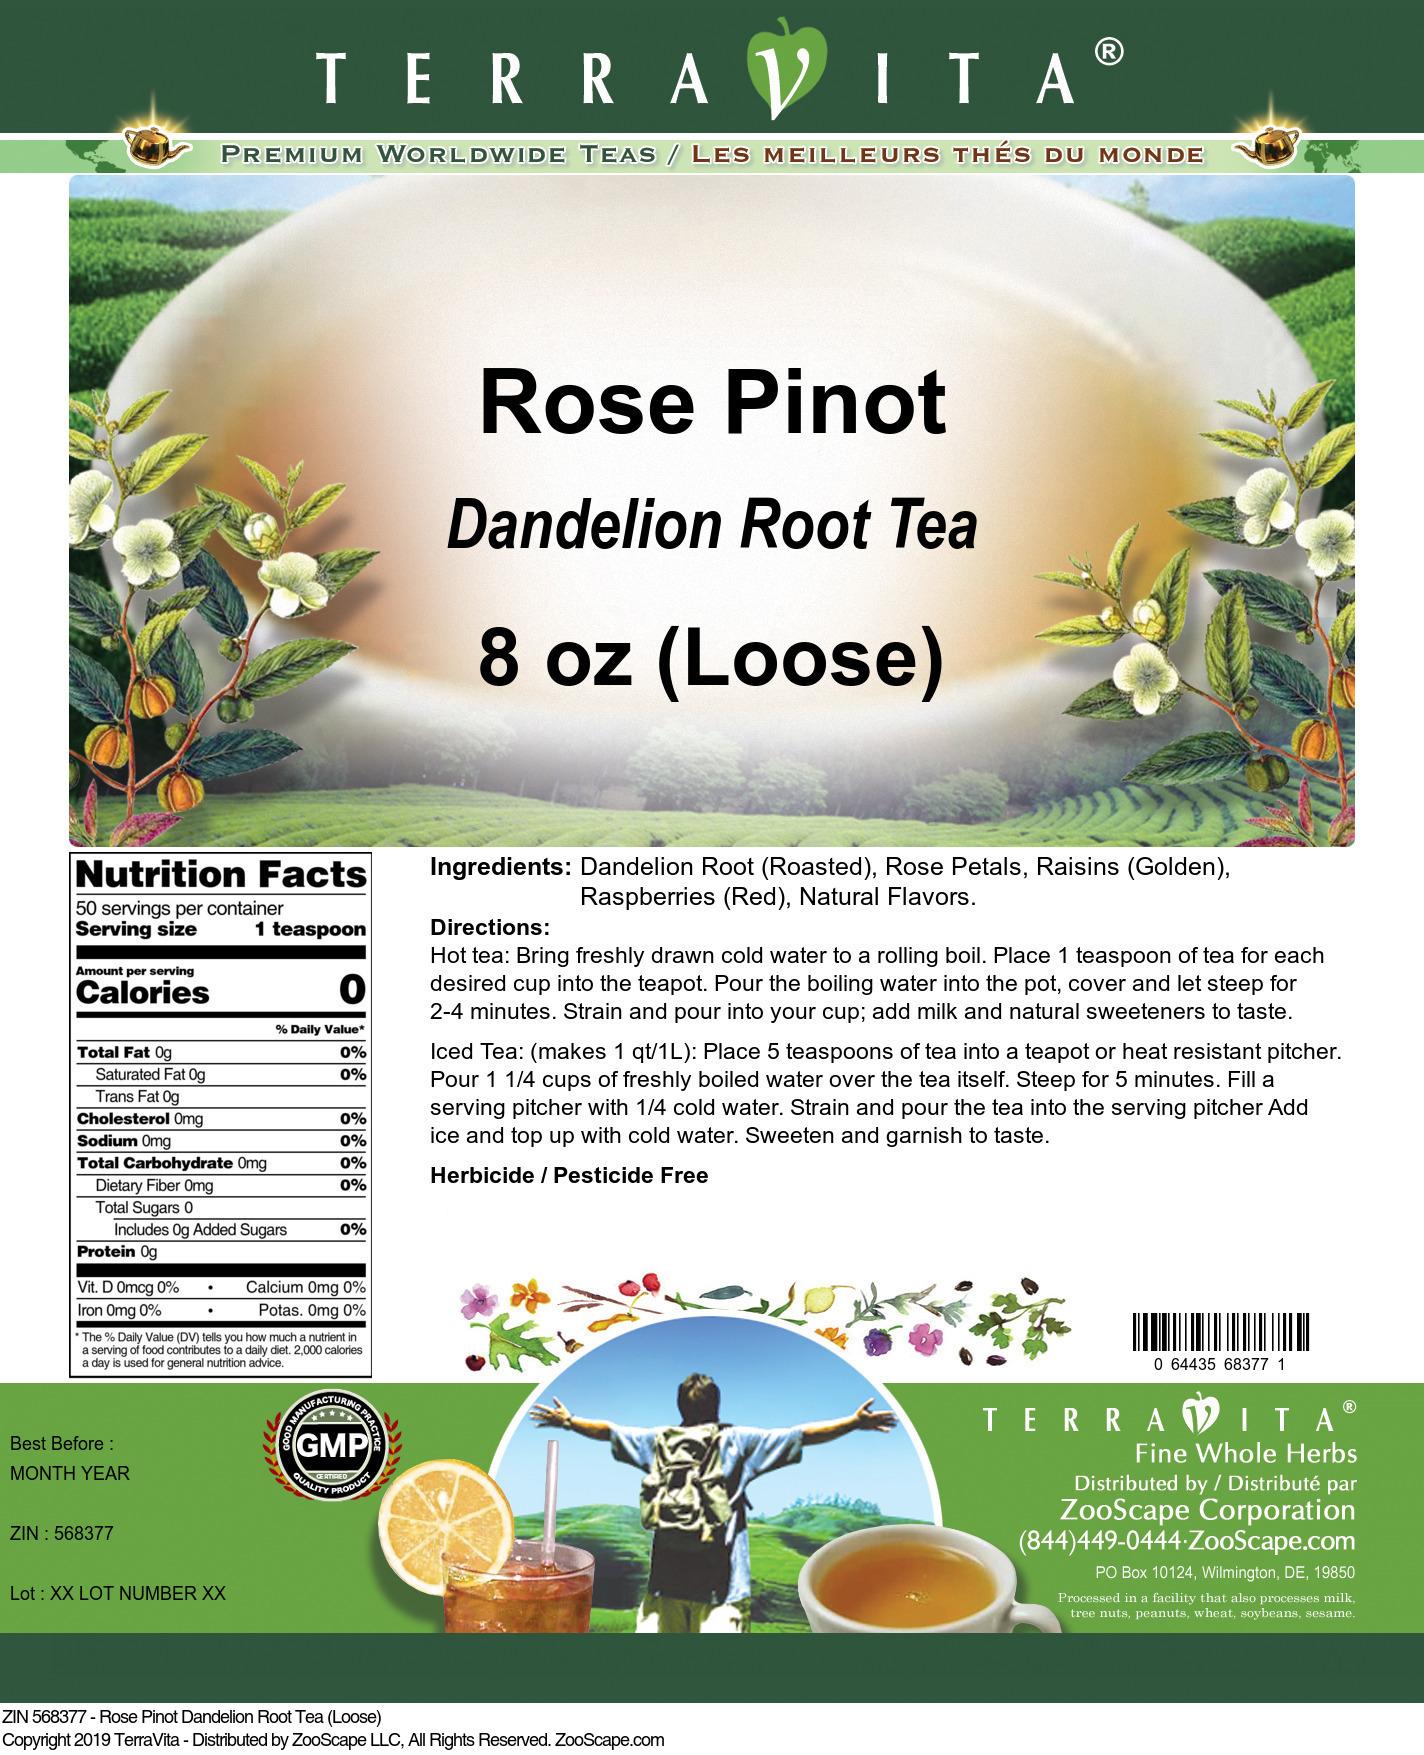 Rose Pinot Dandelion Root